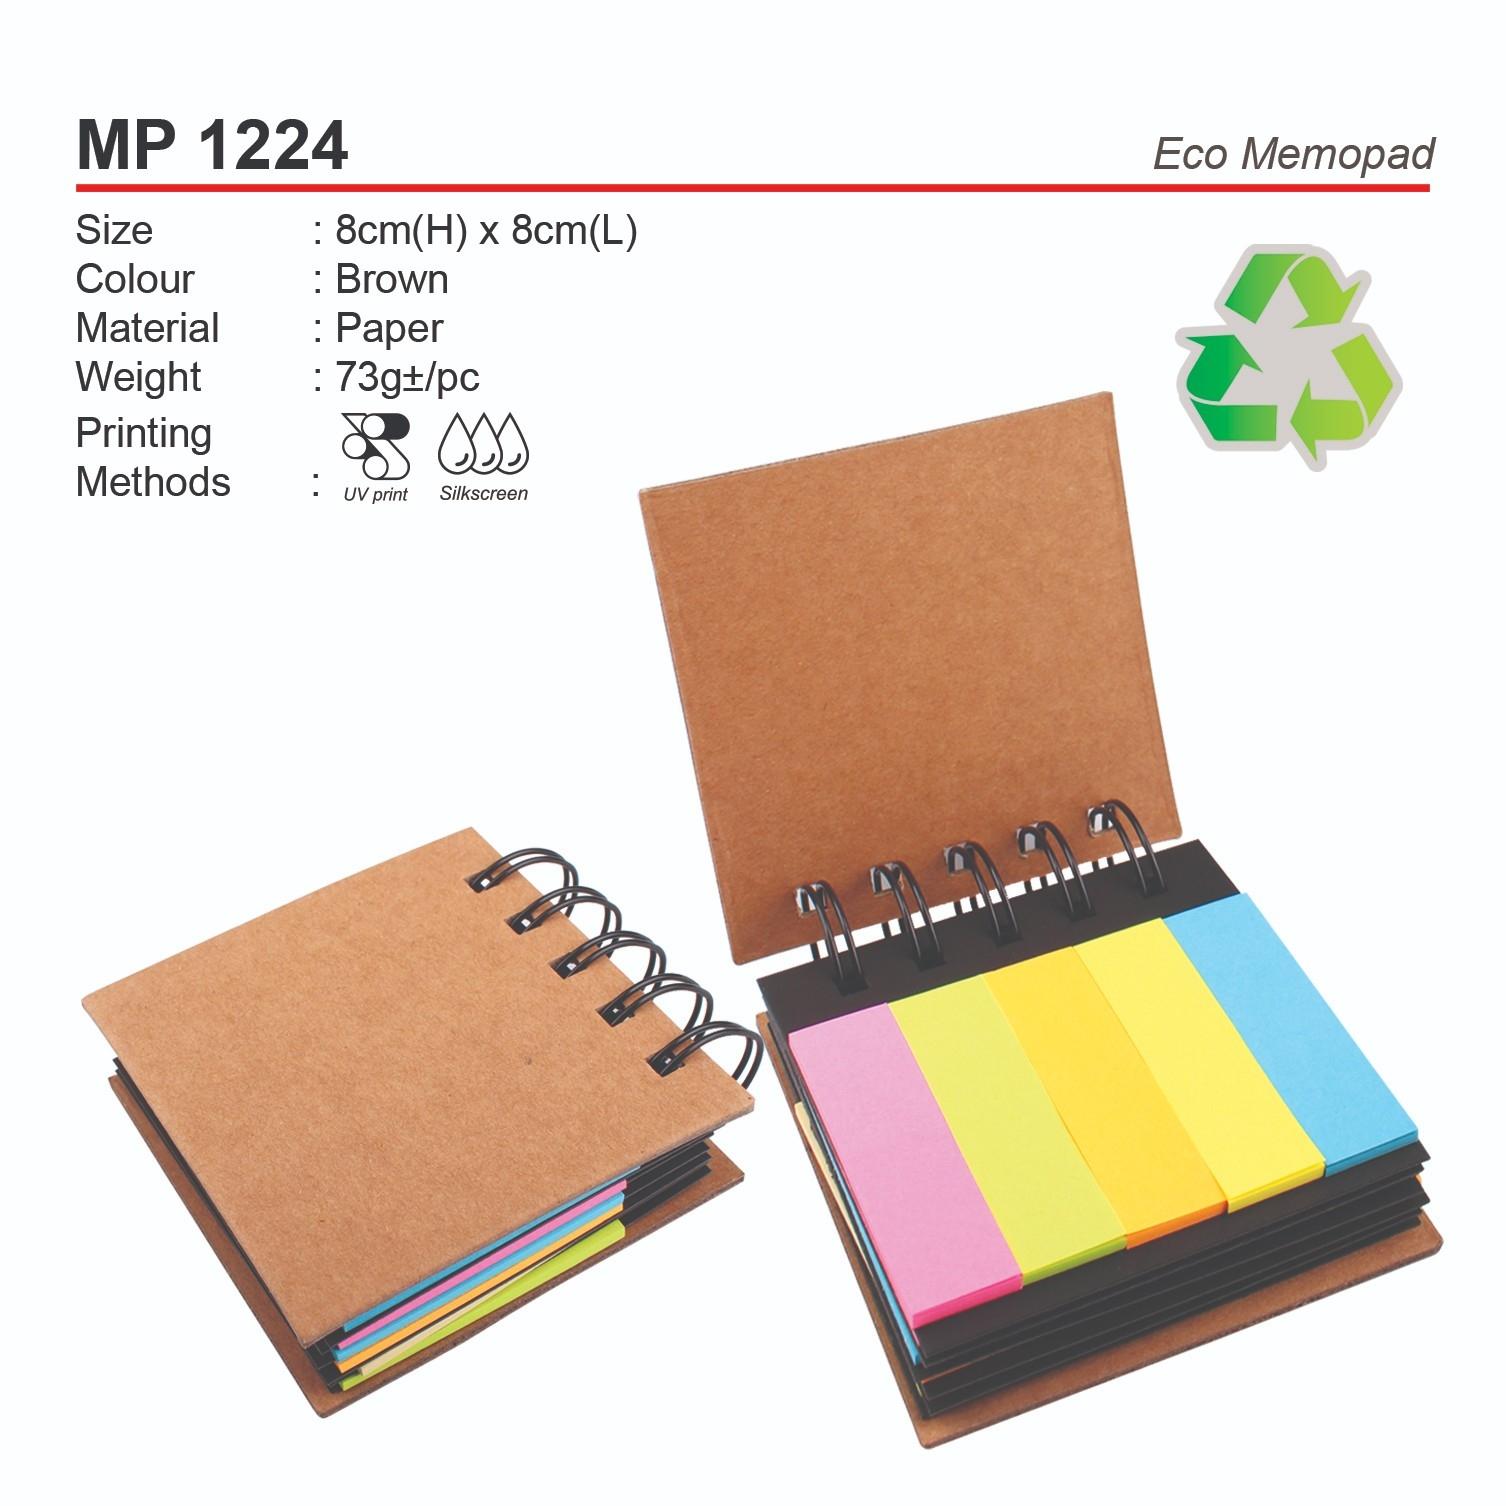 MP 1224 Eco Memopad